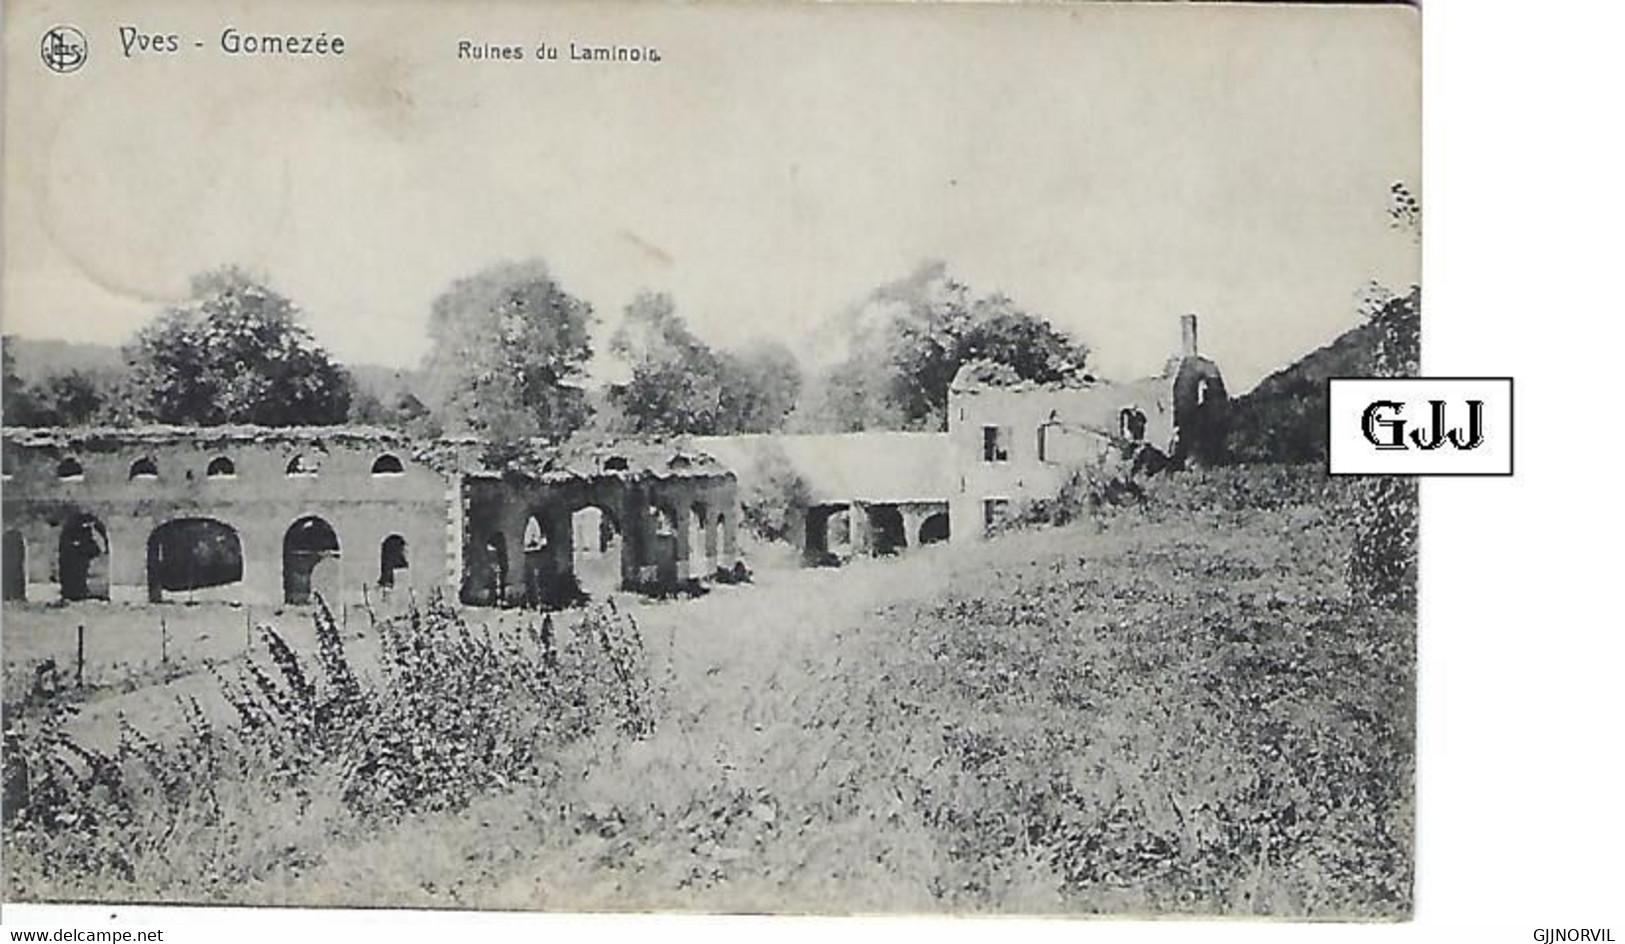 WALCOURT - YVES-GOMEZEE - Ruines Du Laminoir - Ed. Ad. Saint-Hubert - Yves-Gomzée - Rare - Walcourt